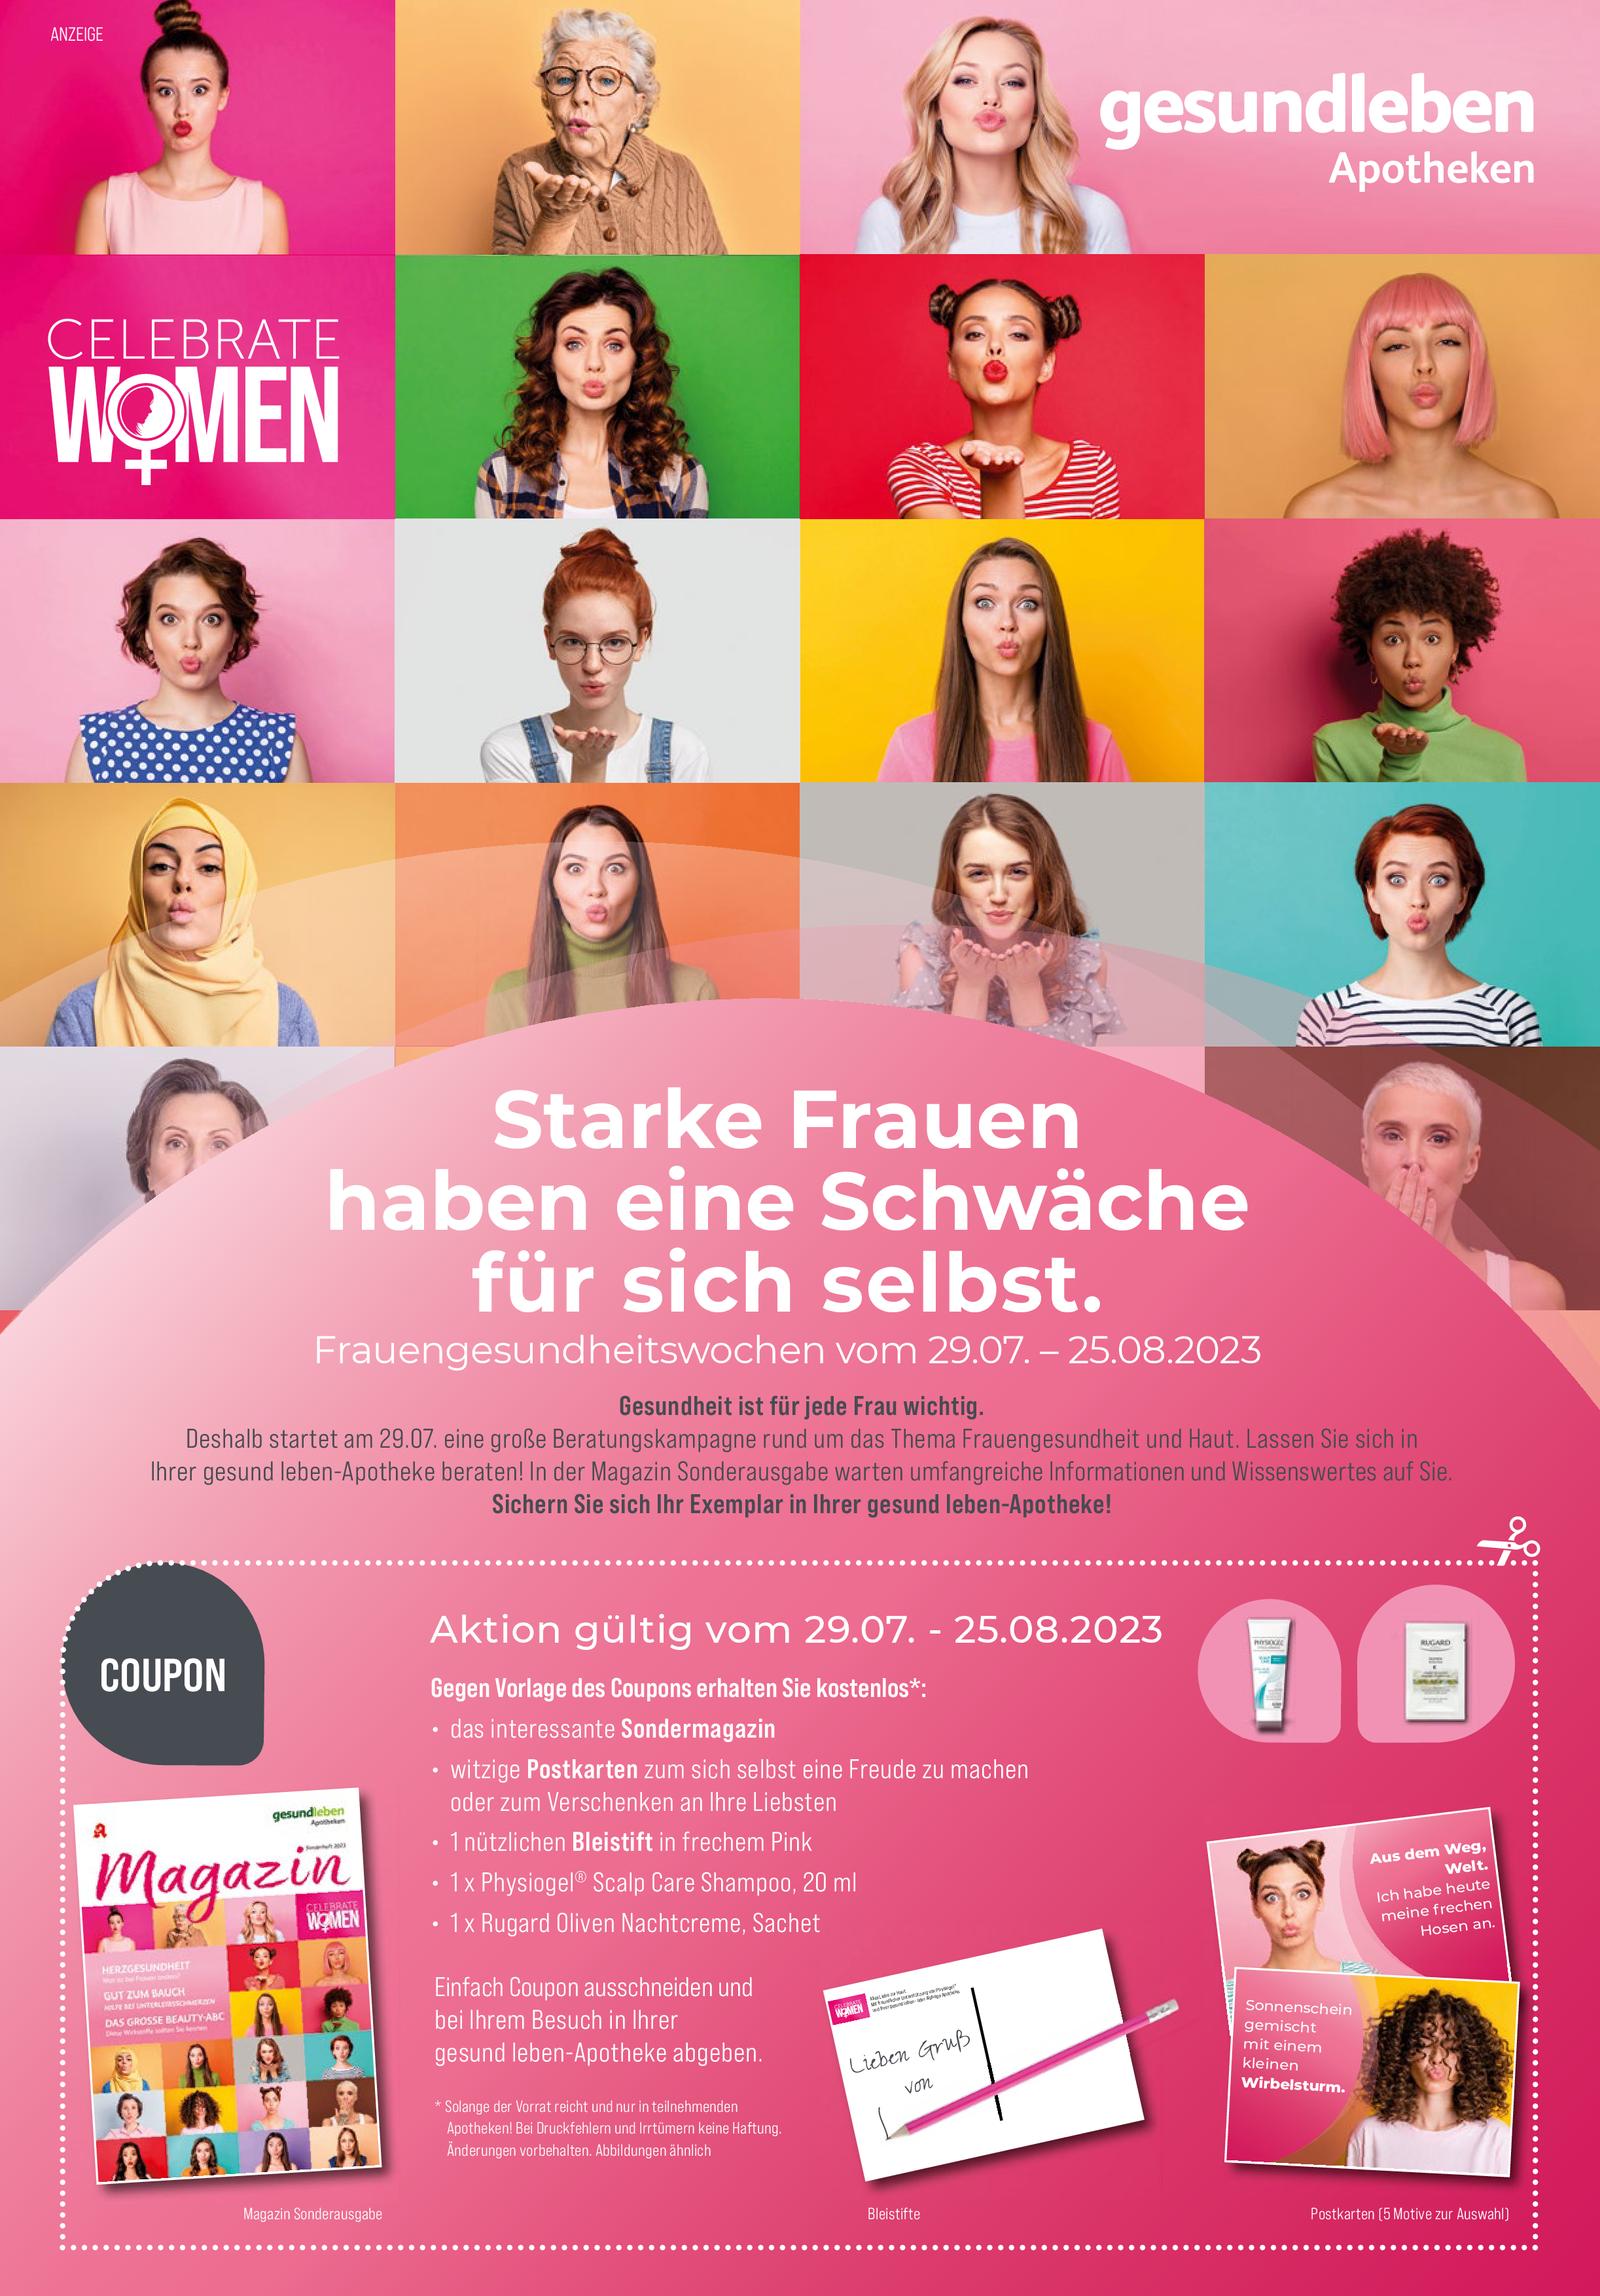 https://mein-uploads.apocdn.net/13294/leaflets/gesundleben_niedrig-Seite5.png